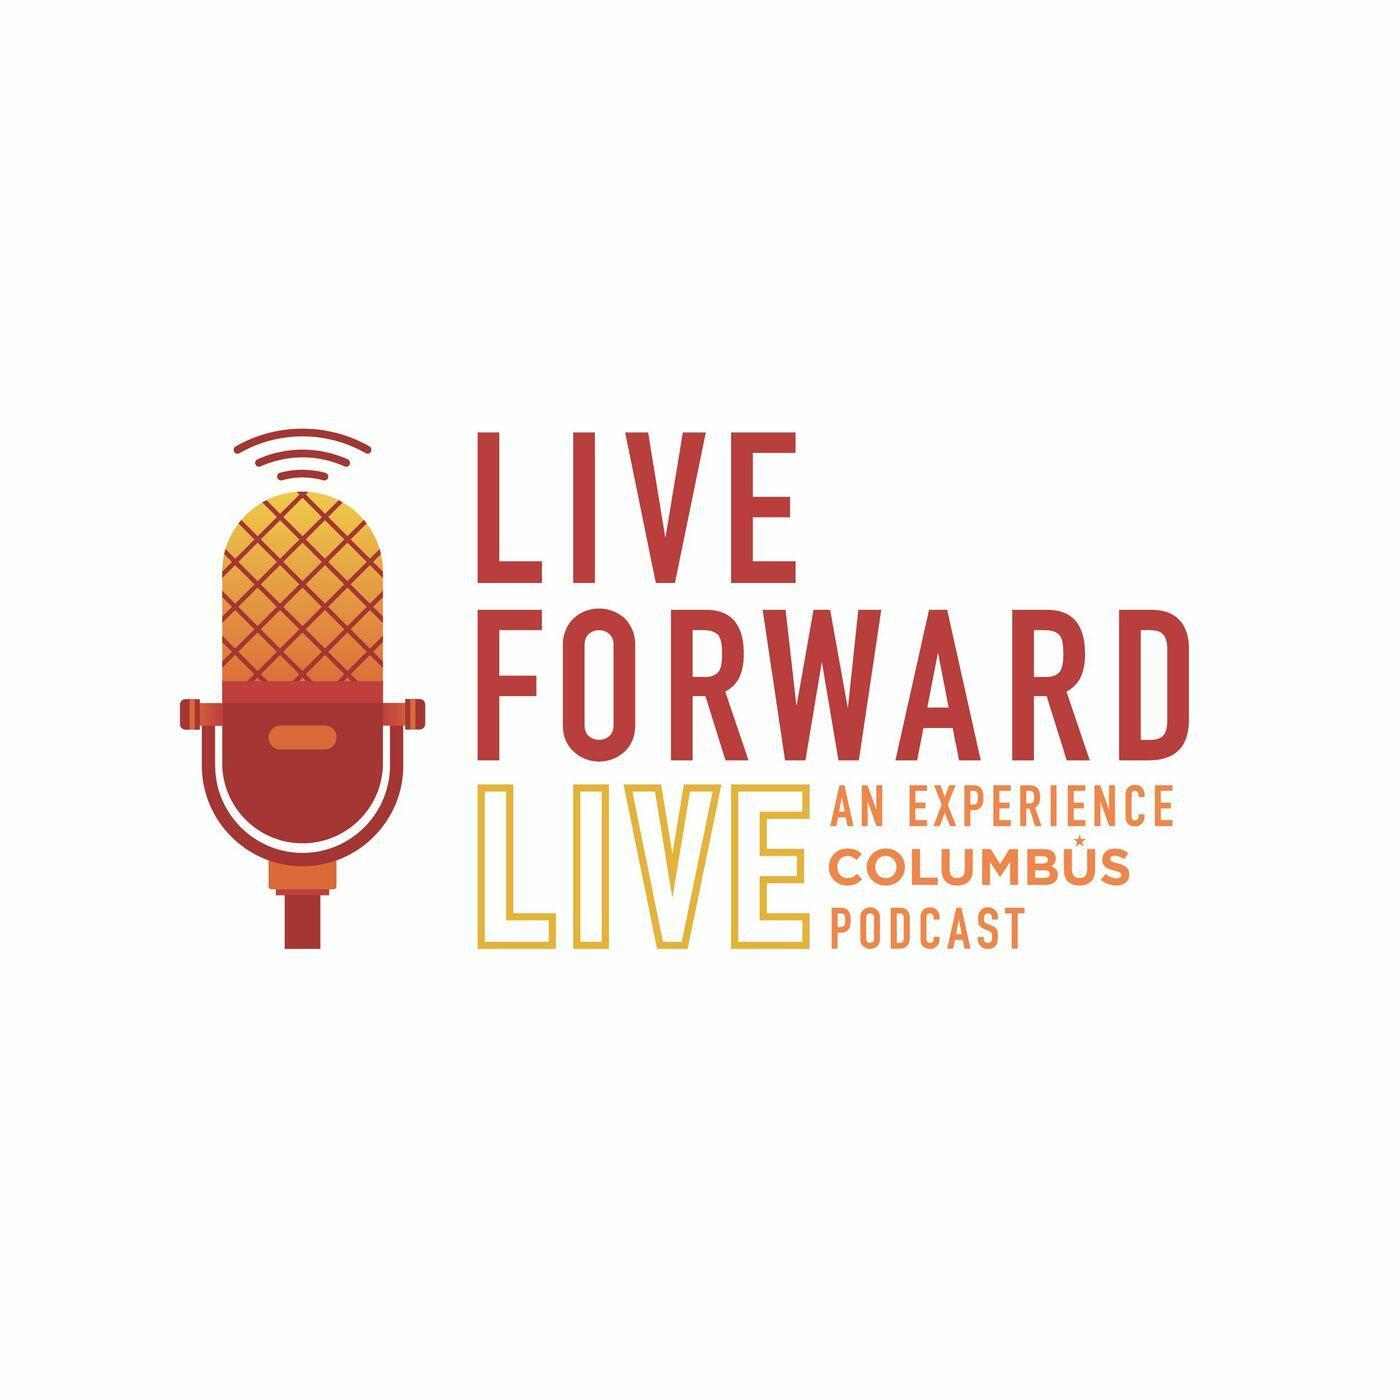 Live Forward Live